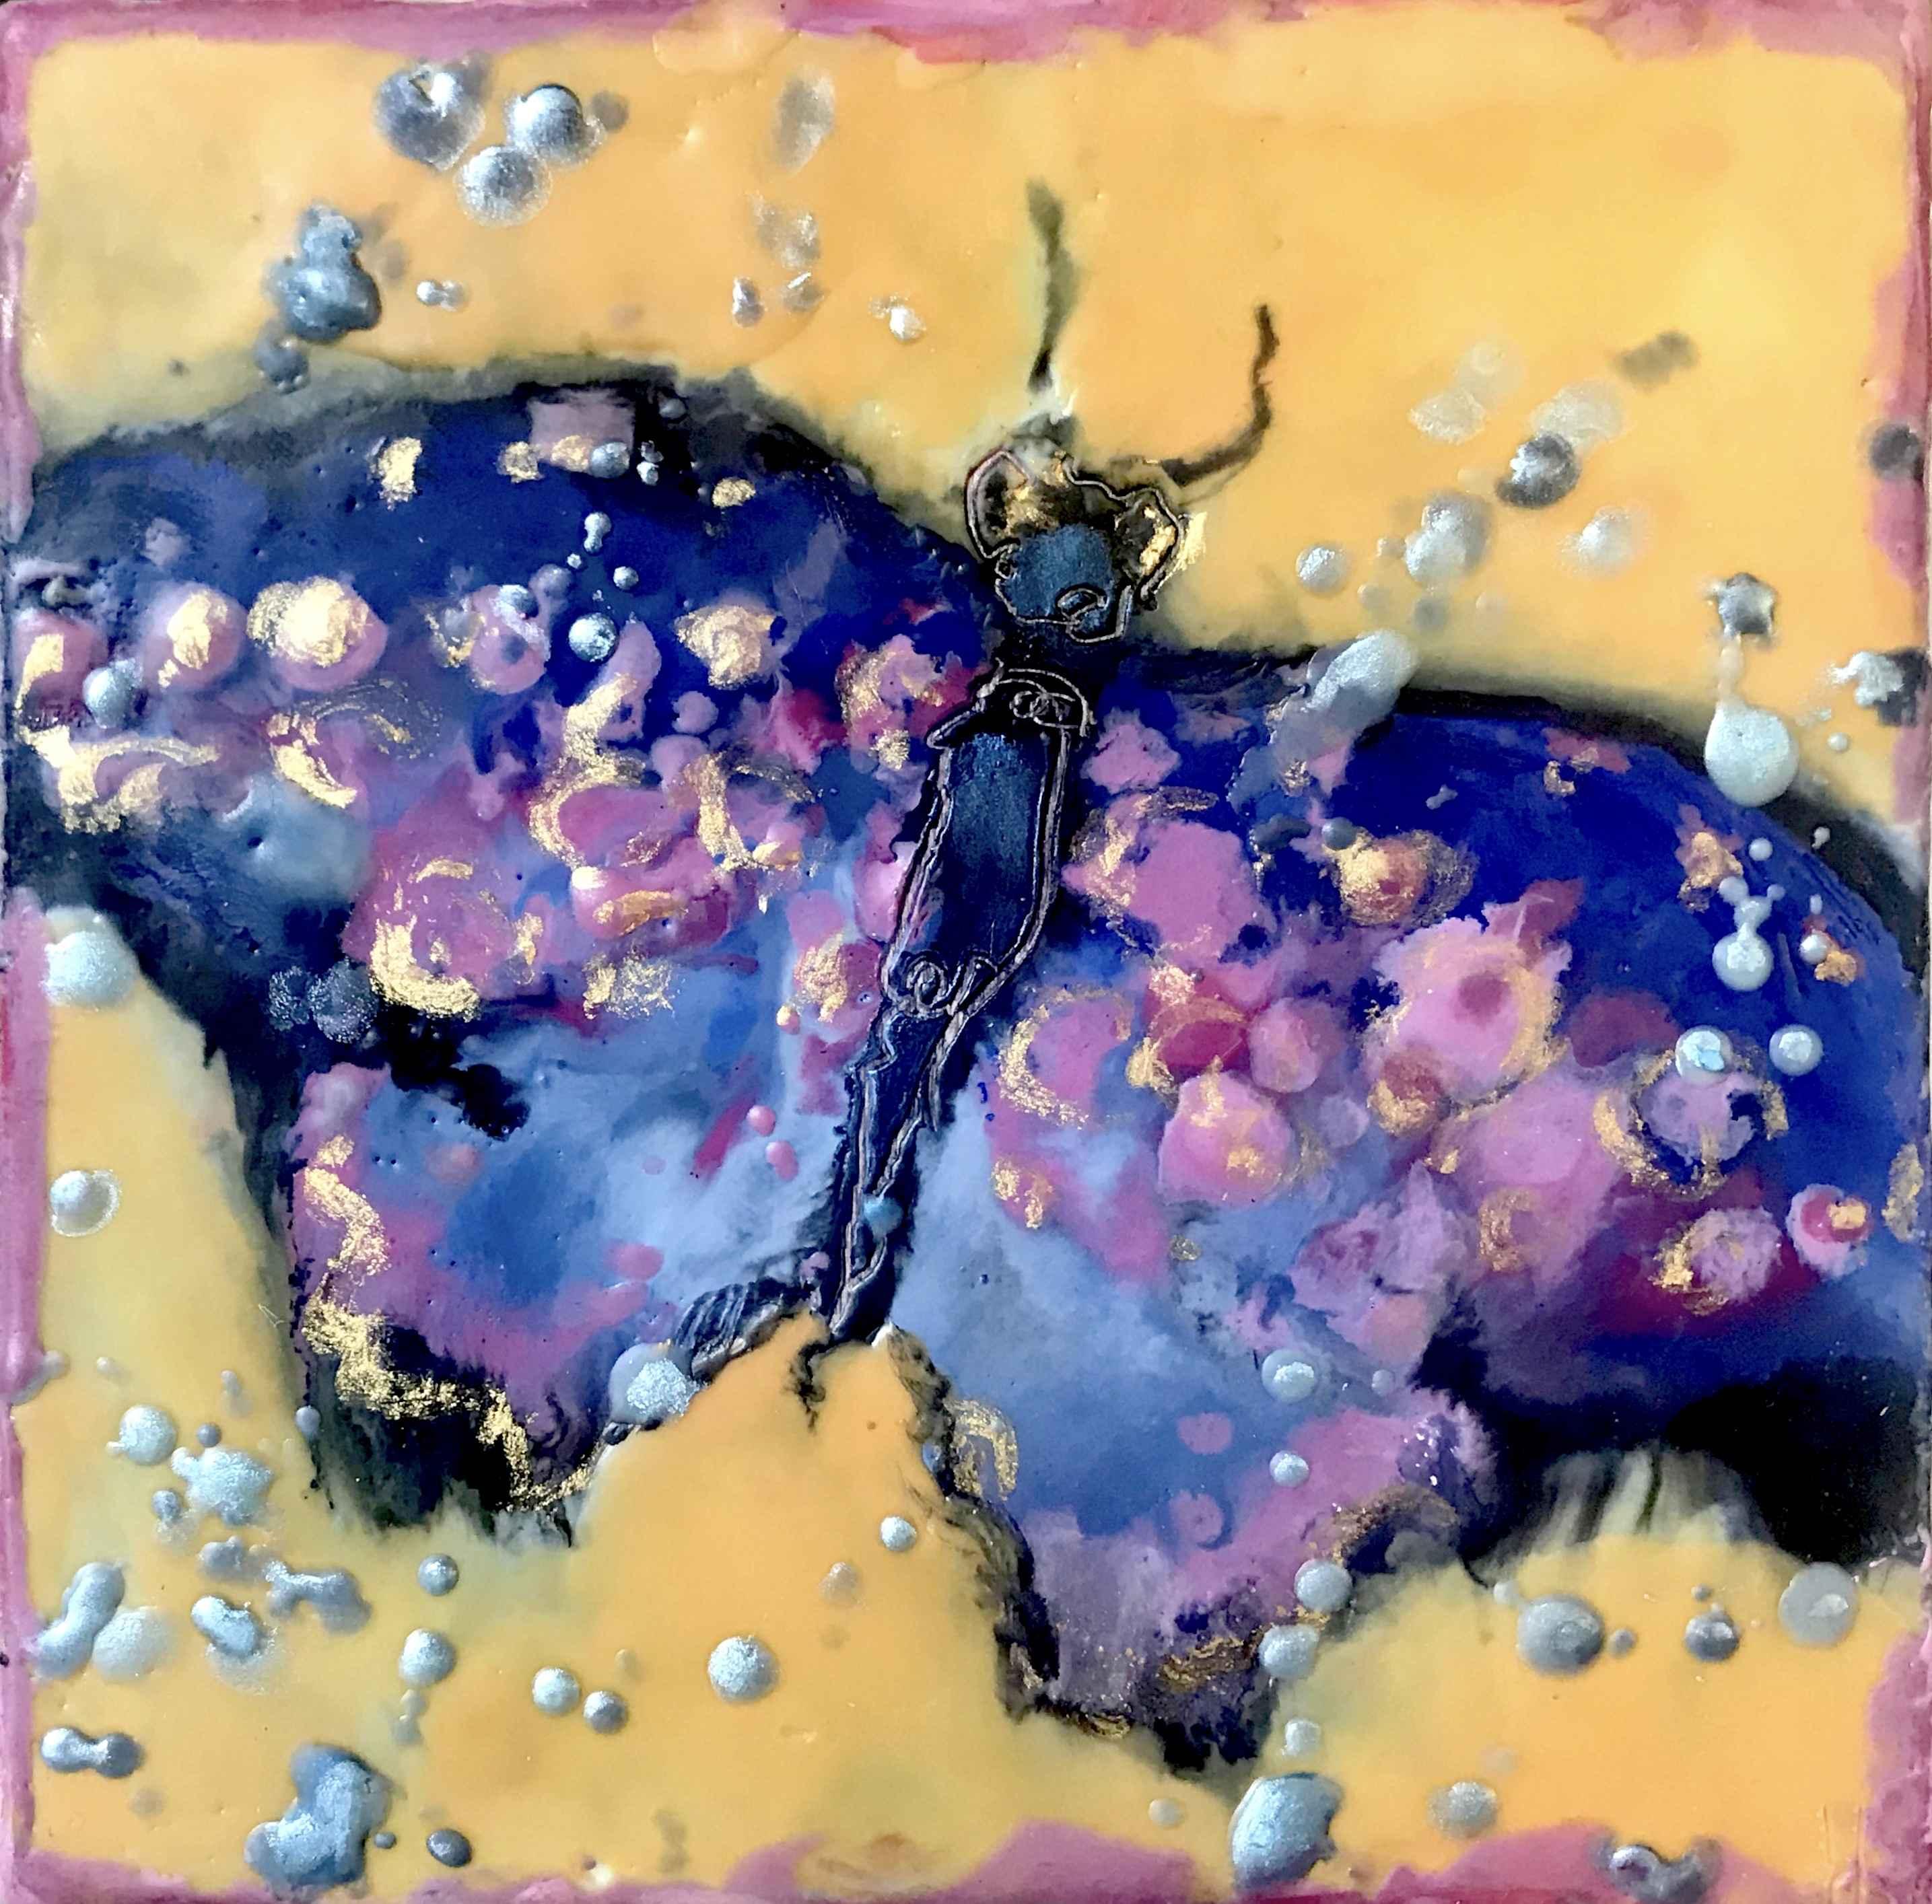 Fantasy Butterfly IV by  Kathy Bradshaw - Masterpiece Online